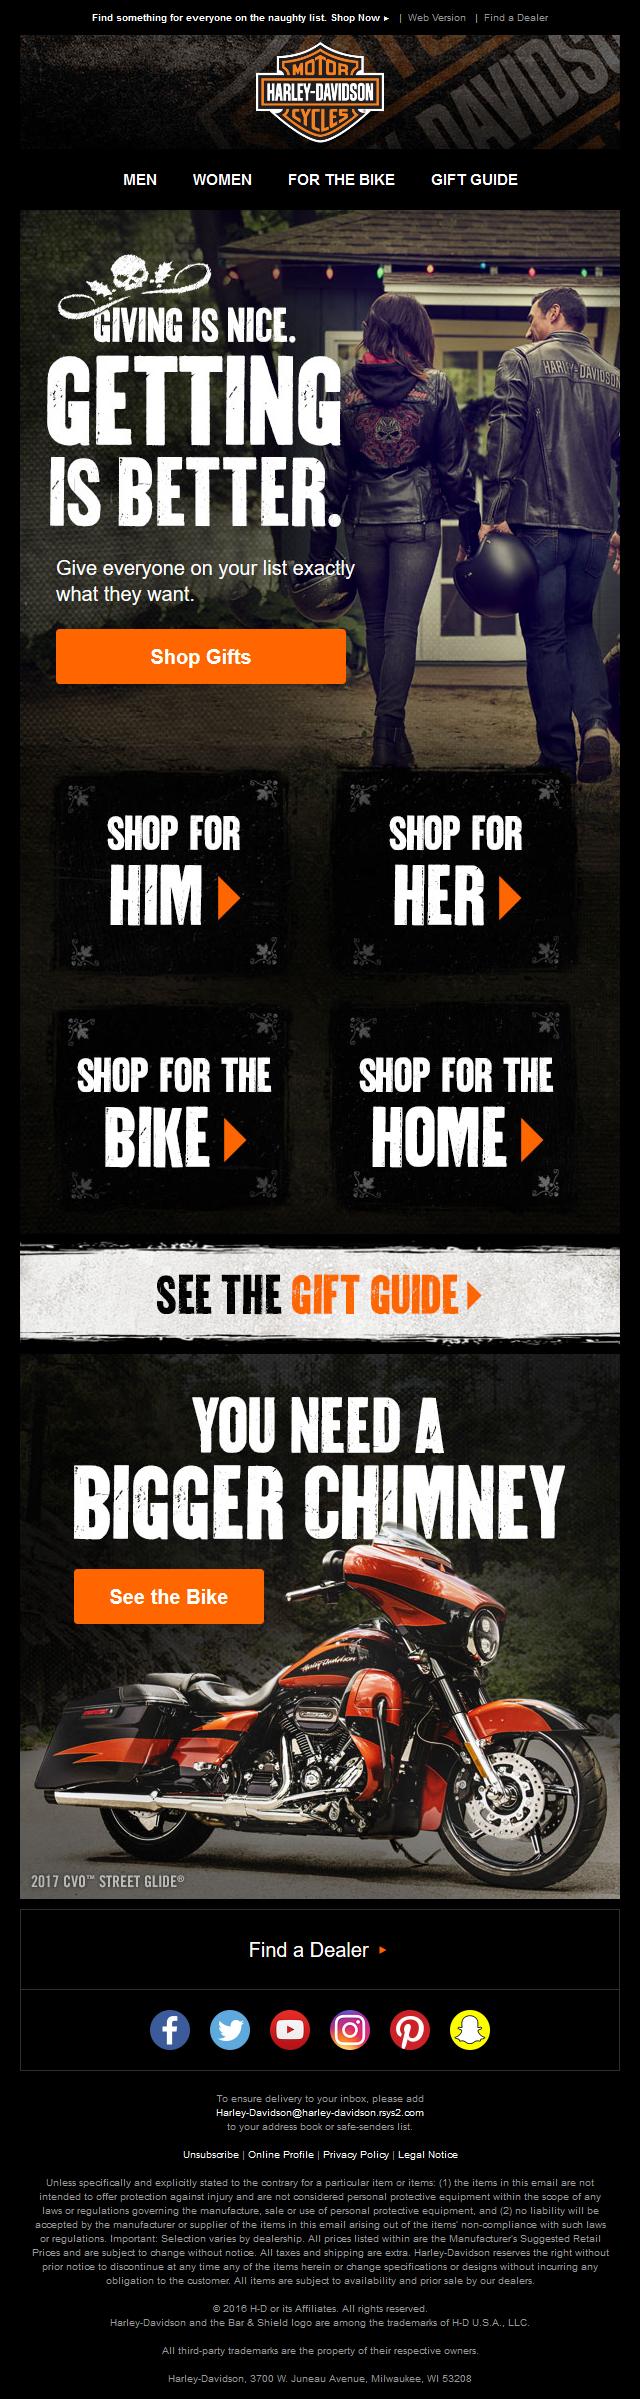 Harley-Davidson - The Baddest Deserve the Best